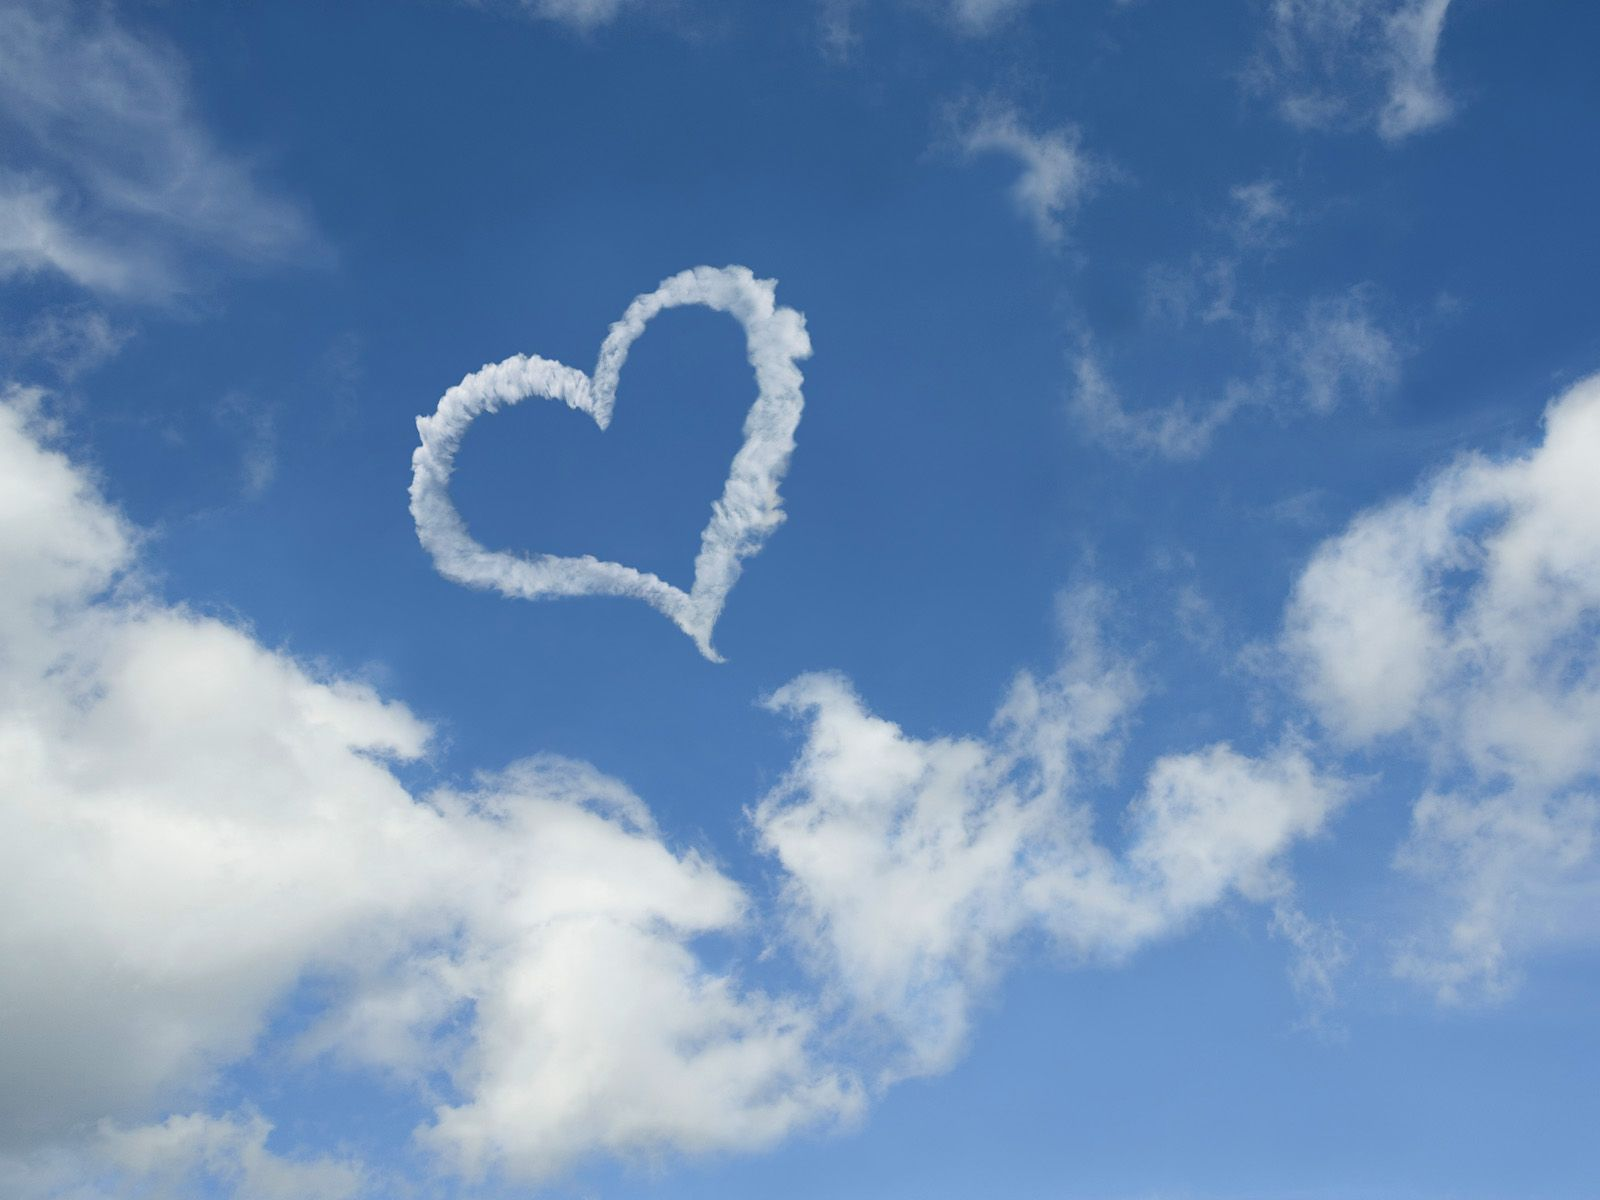 Heart-Shaped Cloud | Corazones! | Pinterest | Heart shapes, Cloud ...